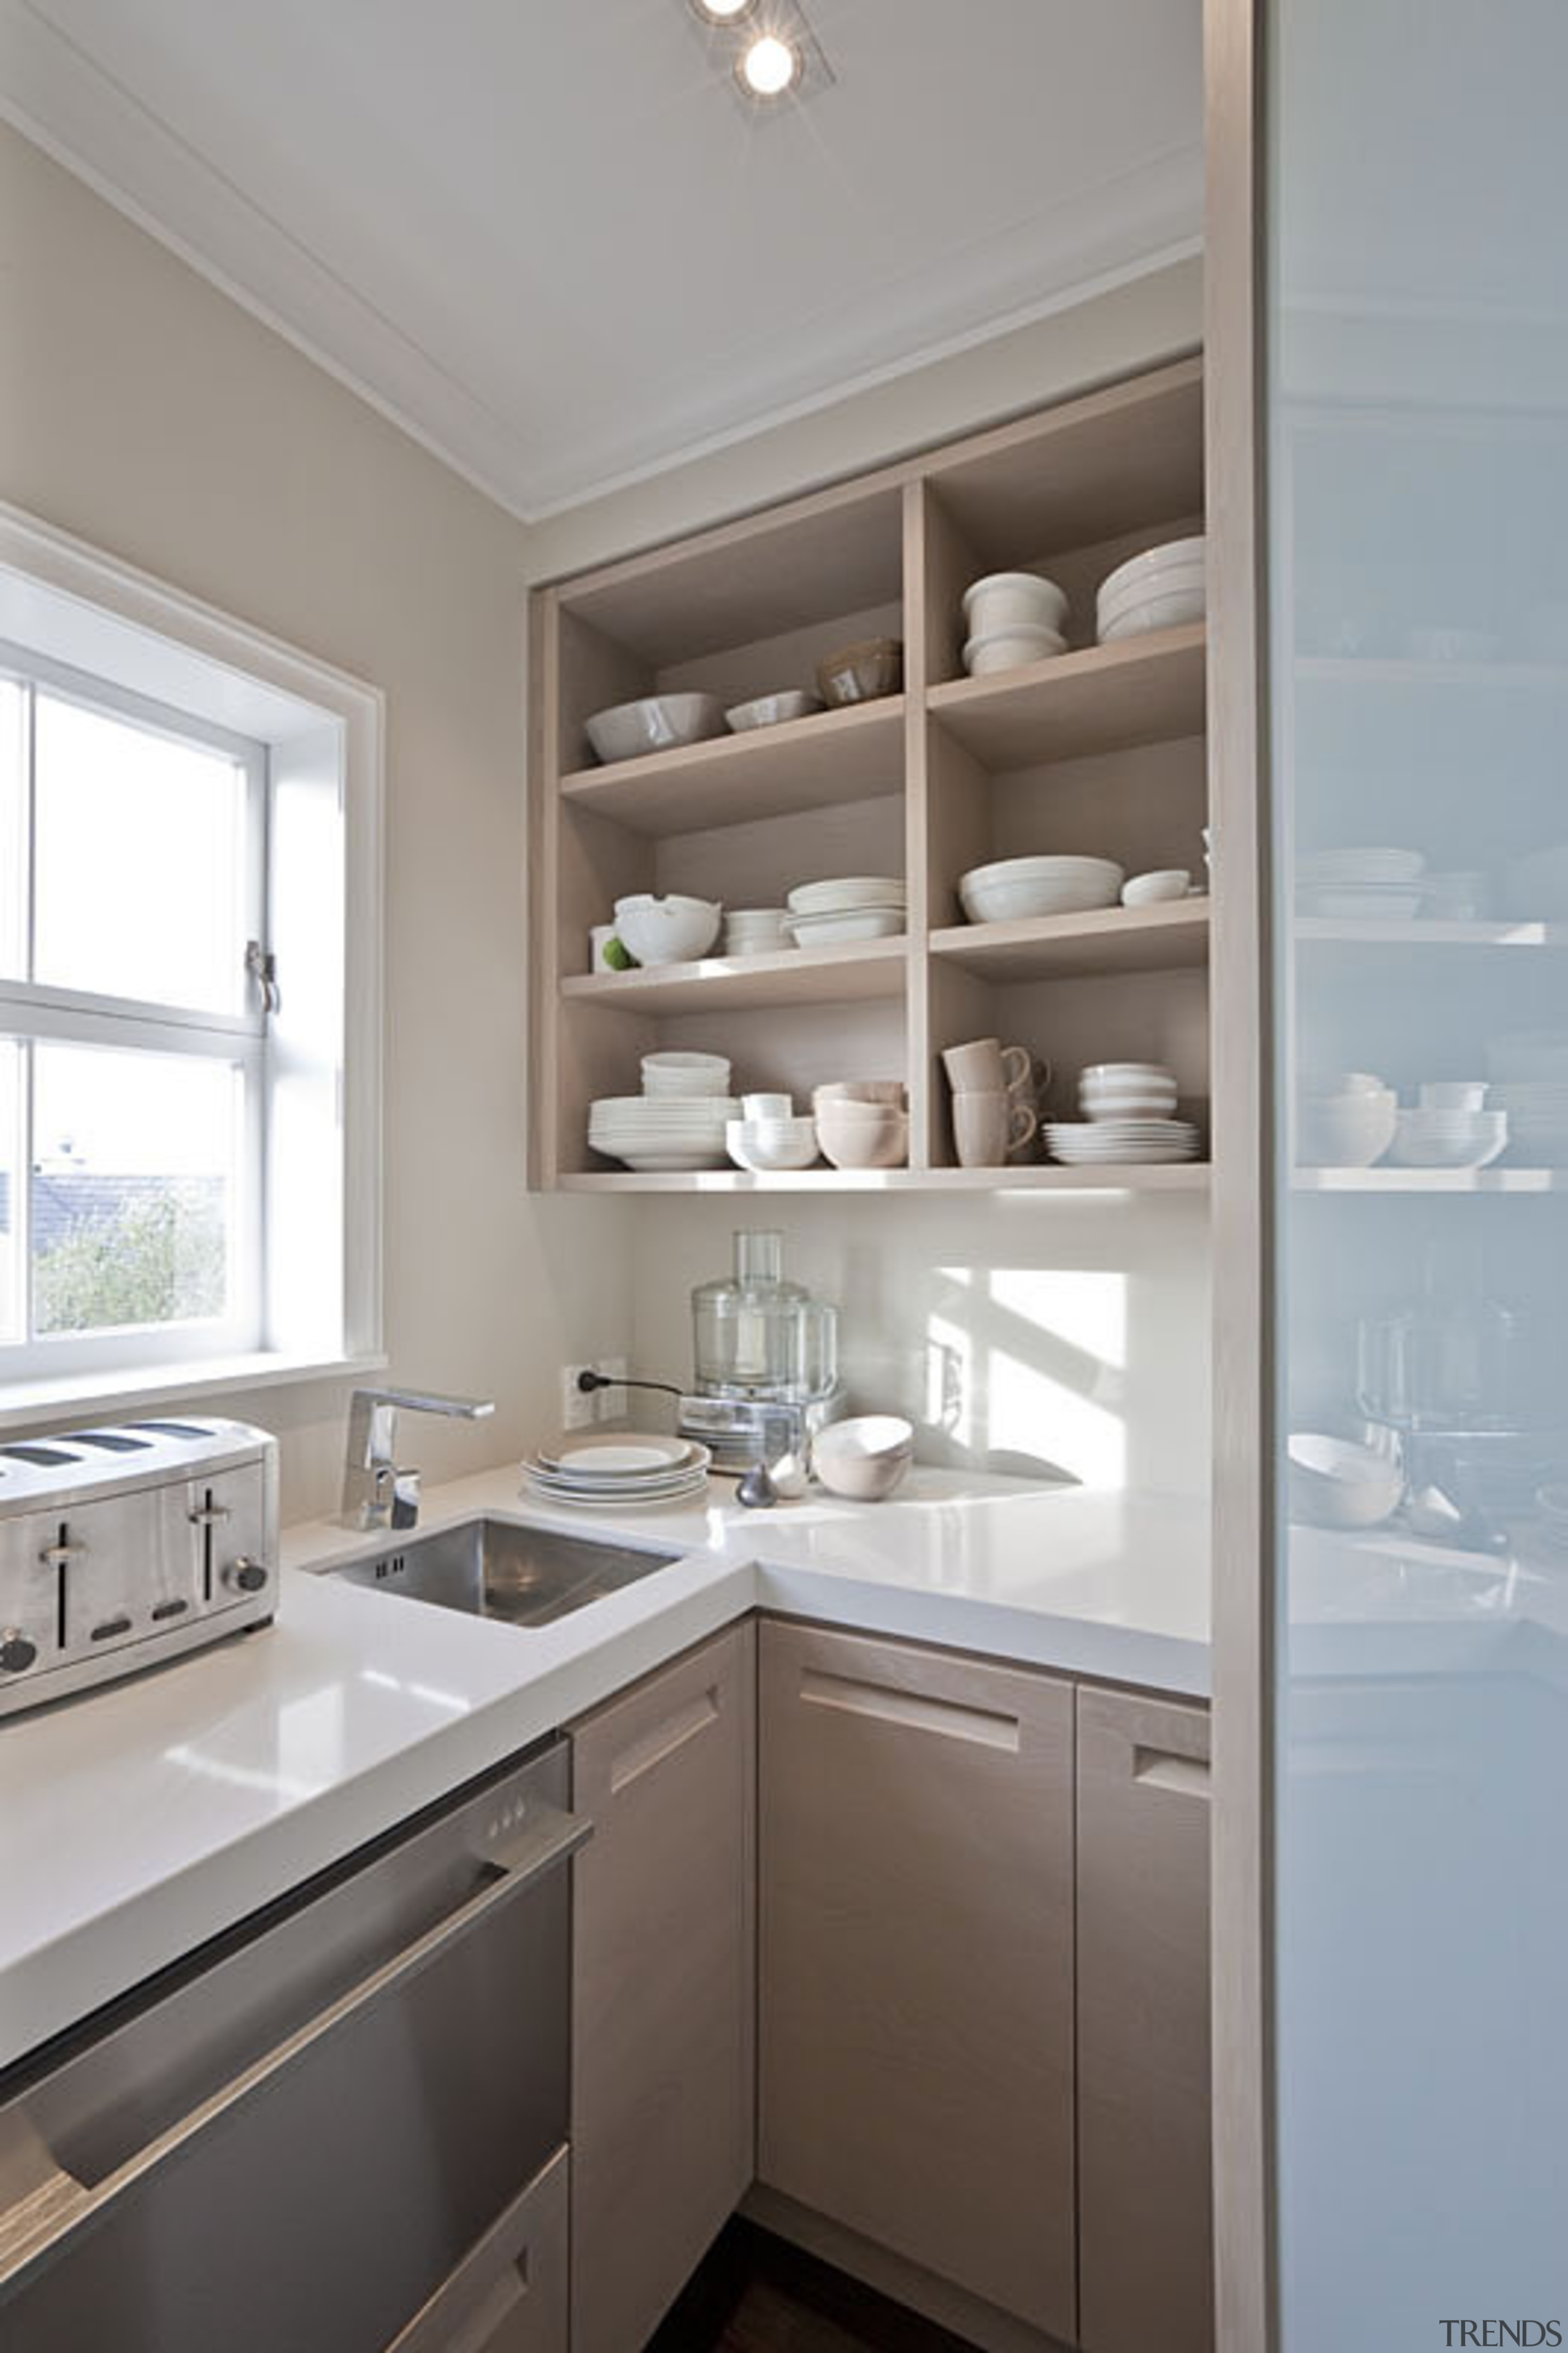 Remuera - cabinetry | countertop | cuisine classique cabinetry, countertop, cuisine classique, home, home appliance, interior design, kitchen, real estate, room, gray